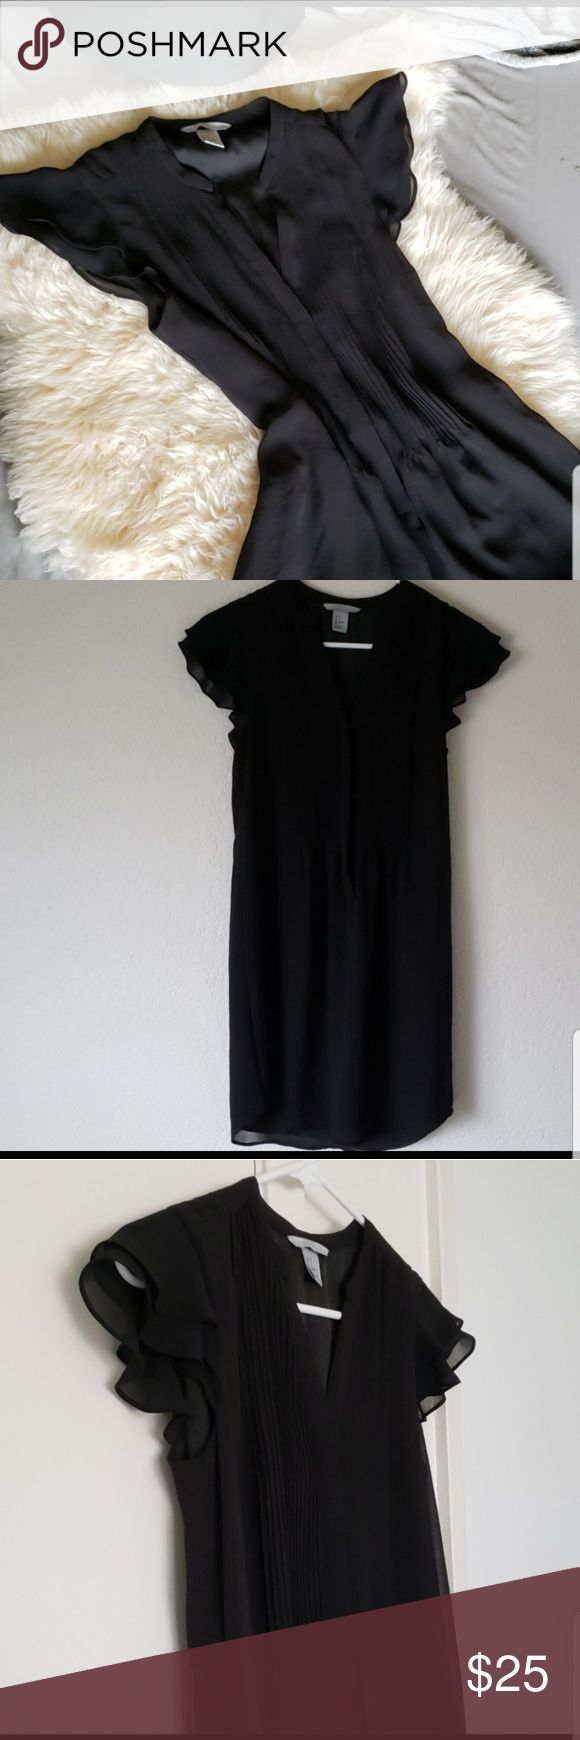 H&M Little black dress Perfect little black dress Features sheer ruffle sleeves …